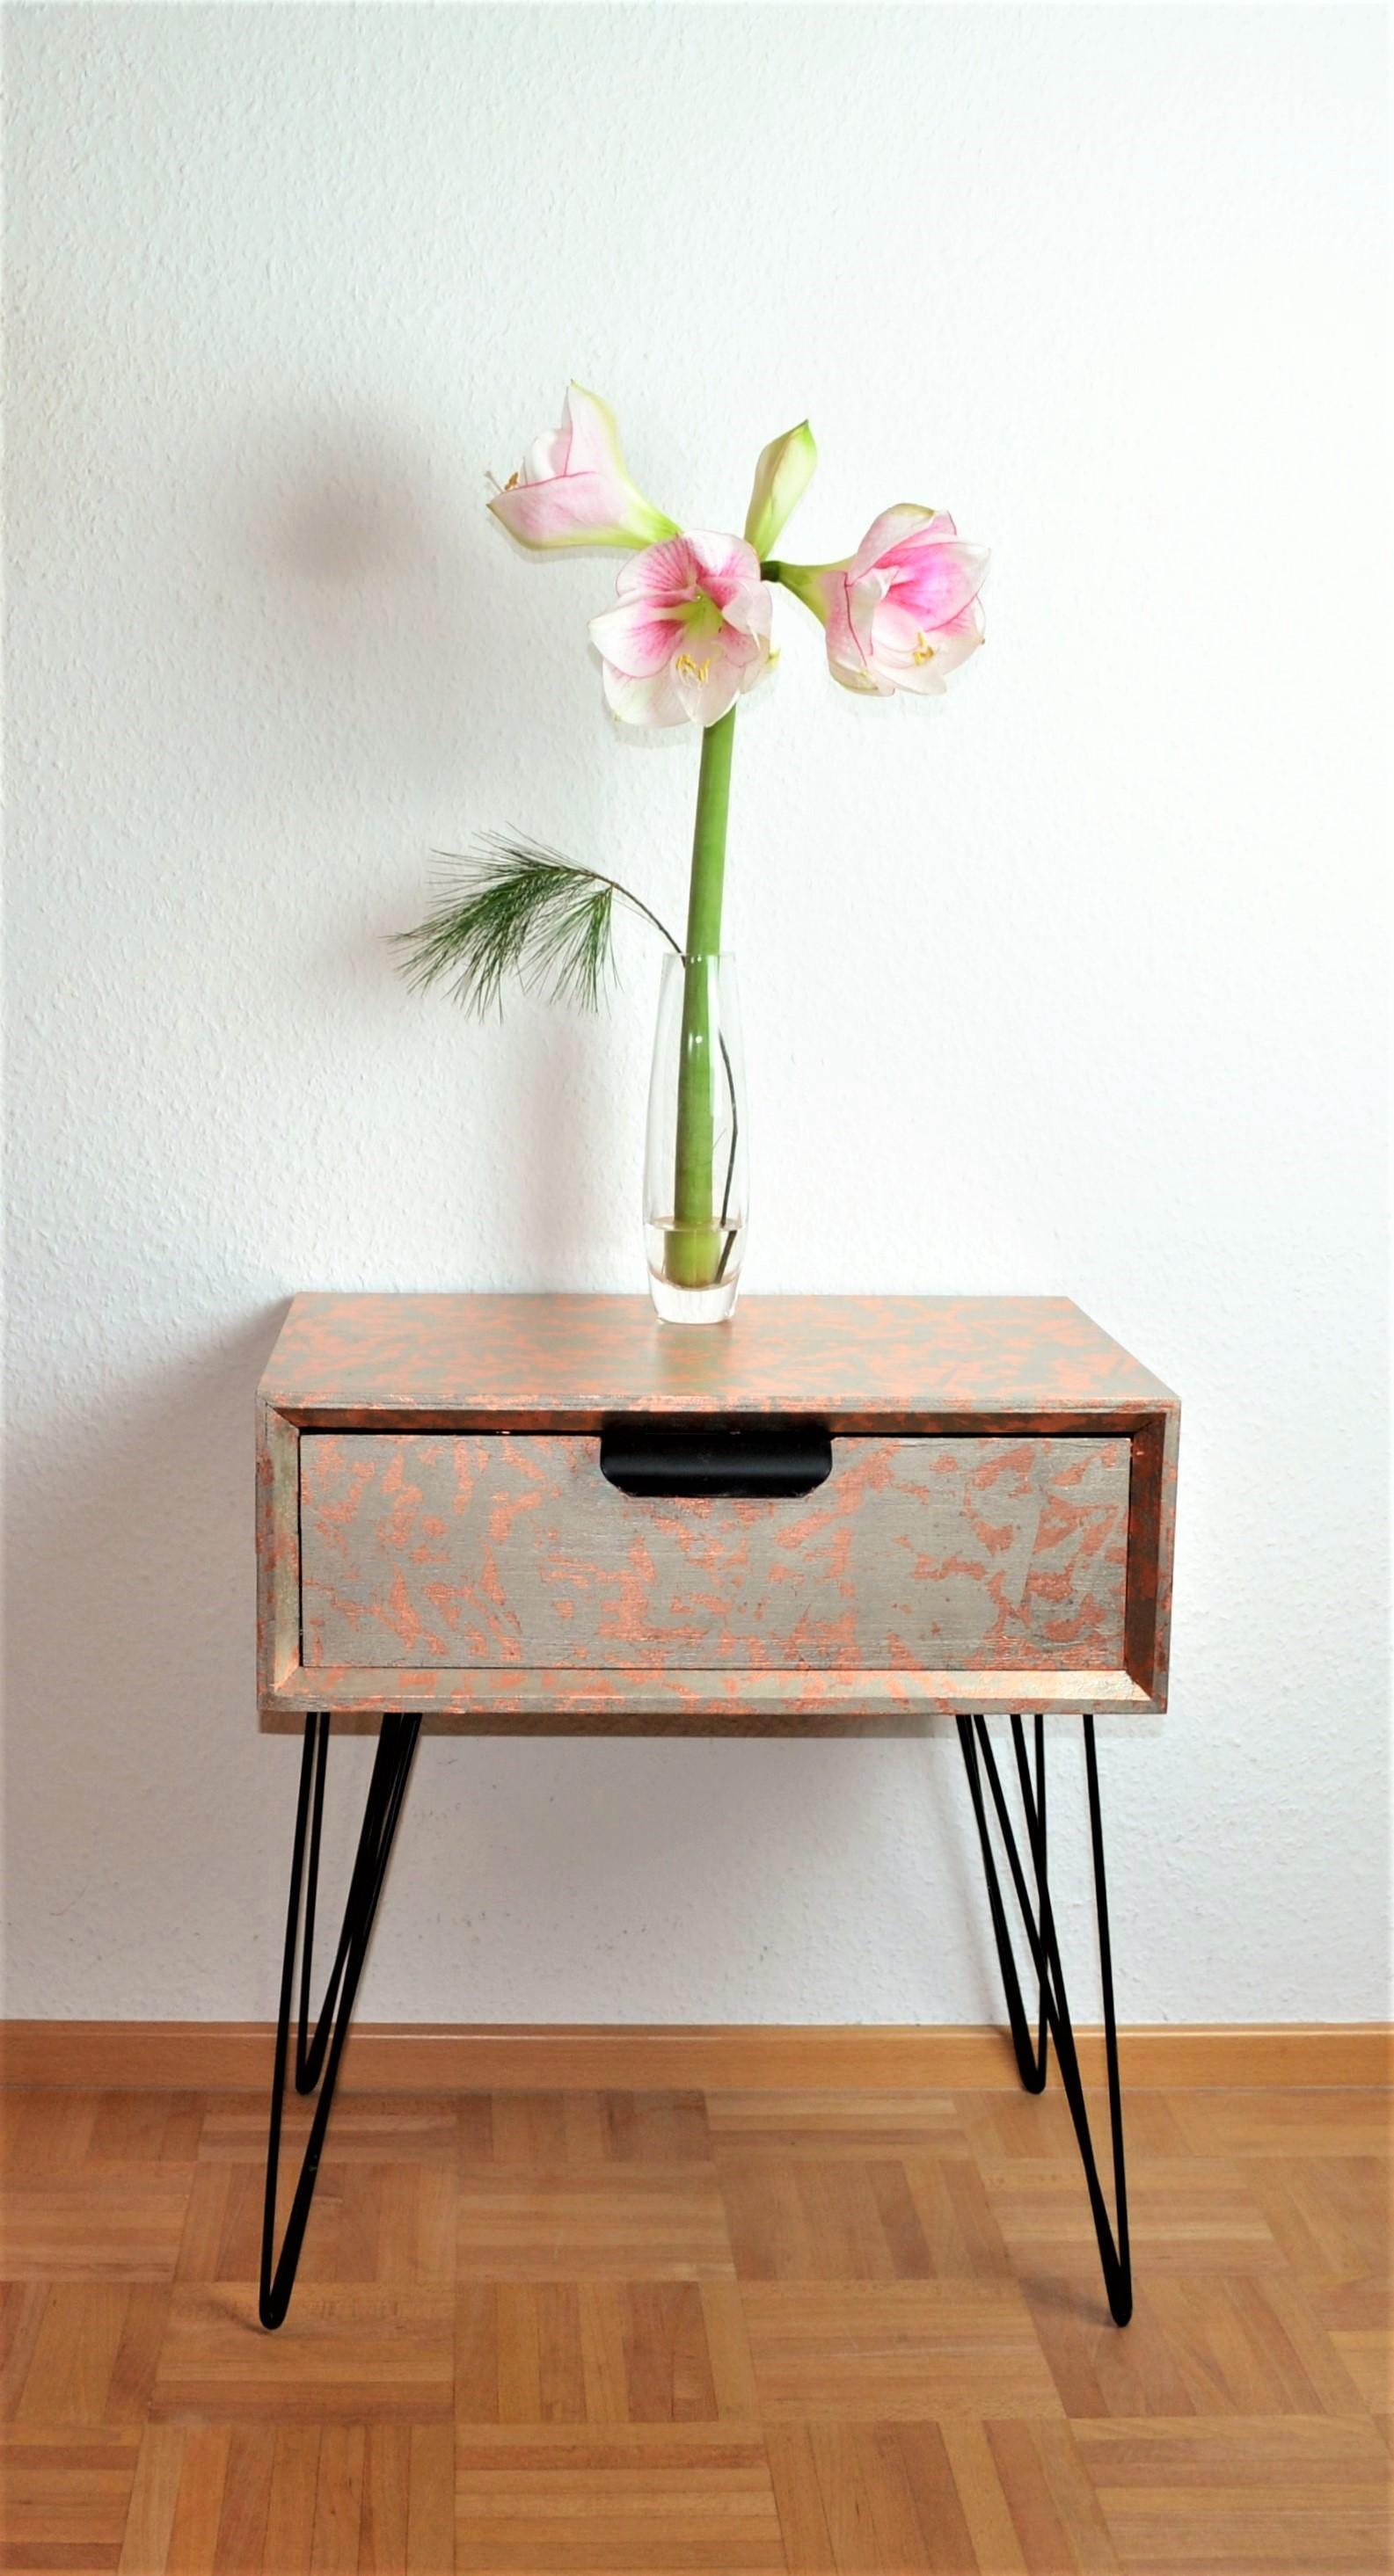 Wandtisch • Bilder & Ideen • COUCH